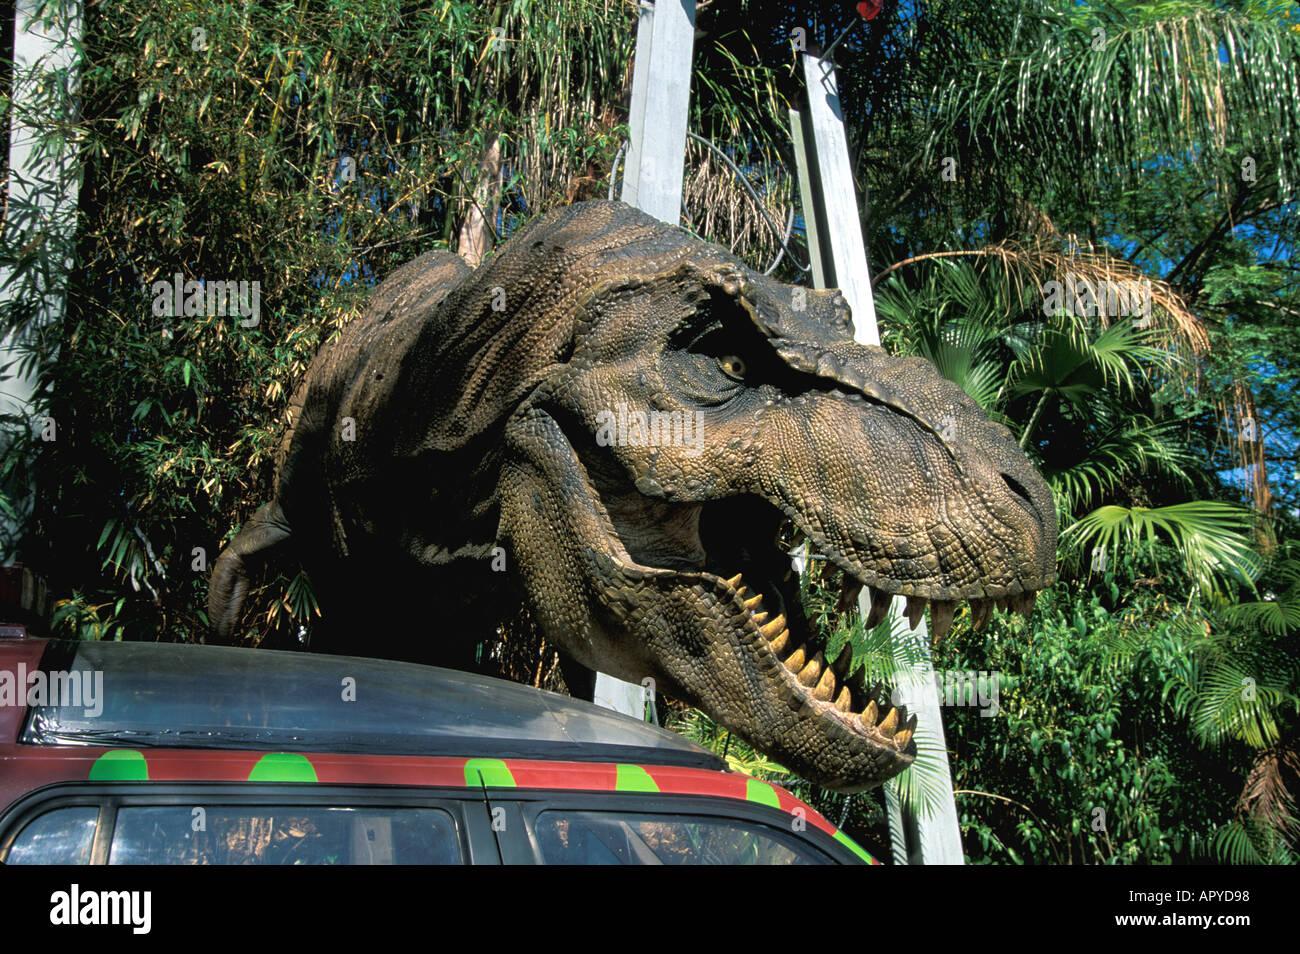 Universal Studios Orlando Fl Dinosaurio De Jurassic Park Al Lado De Coche Fotografia De Stock Alamy © universal studios & amblin entertainment, inc. alamy